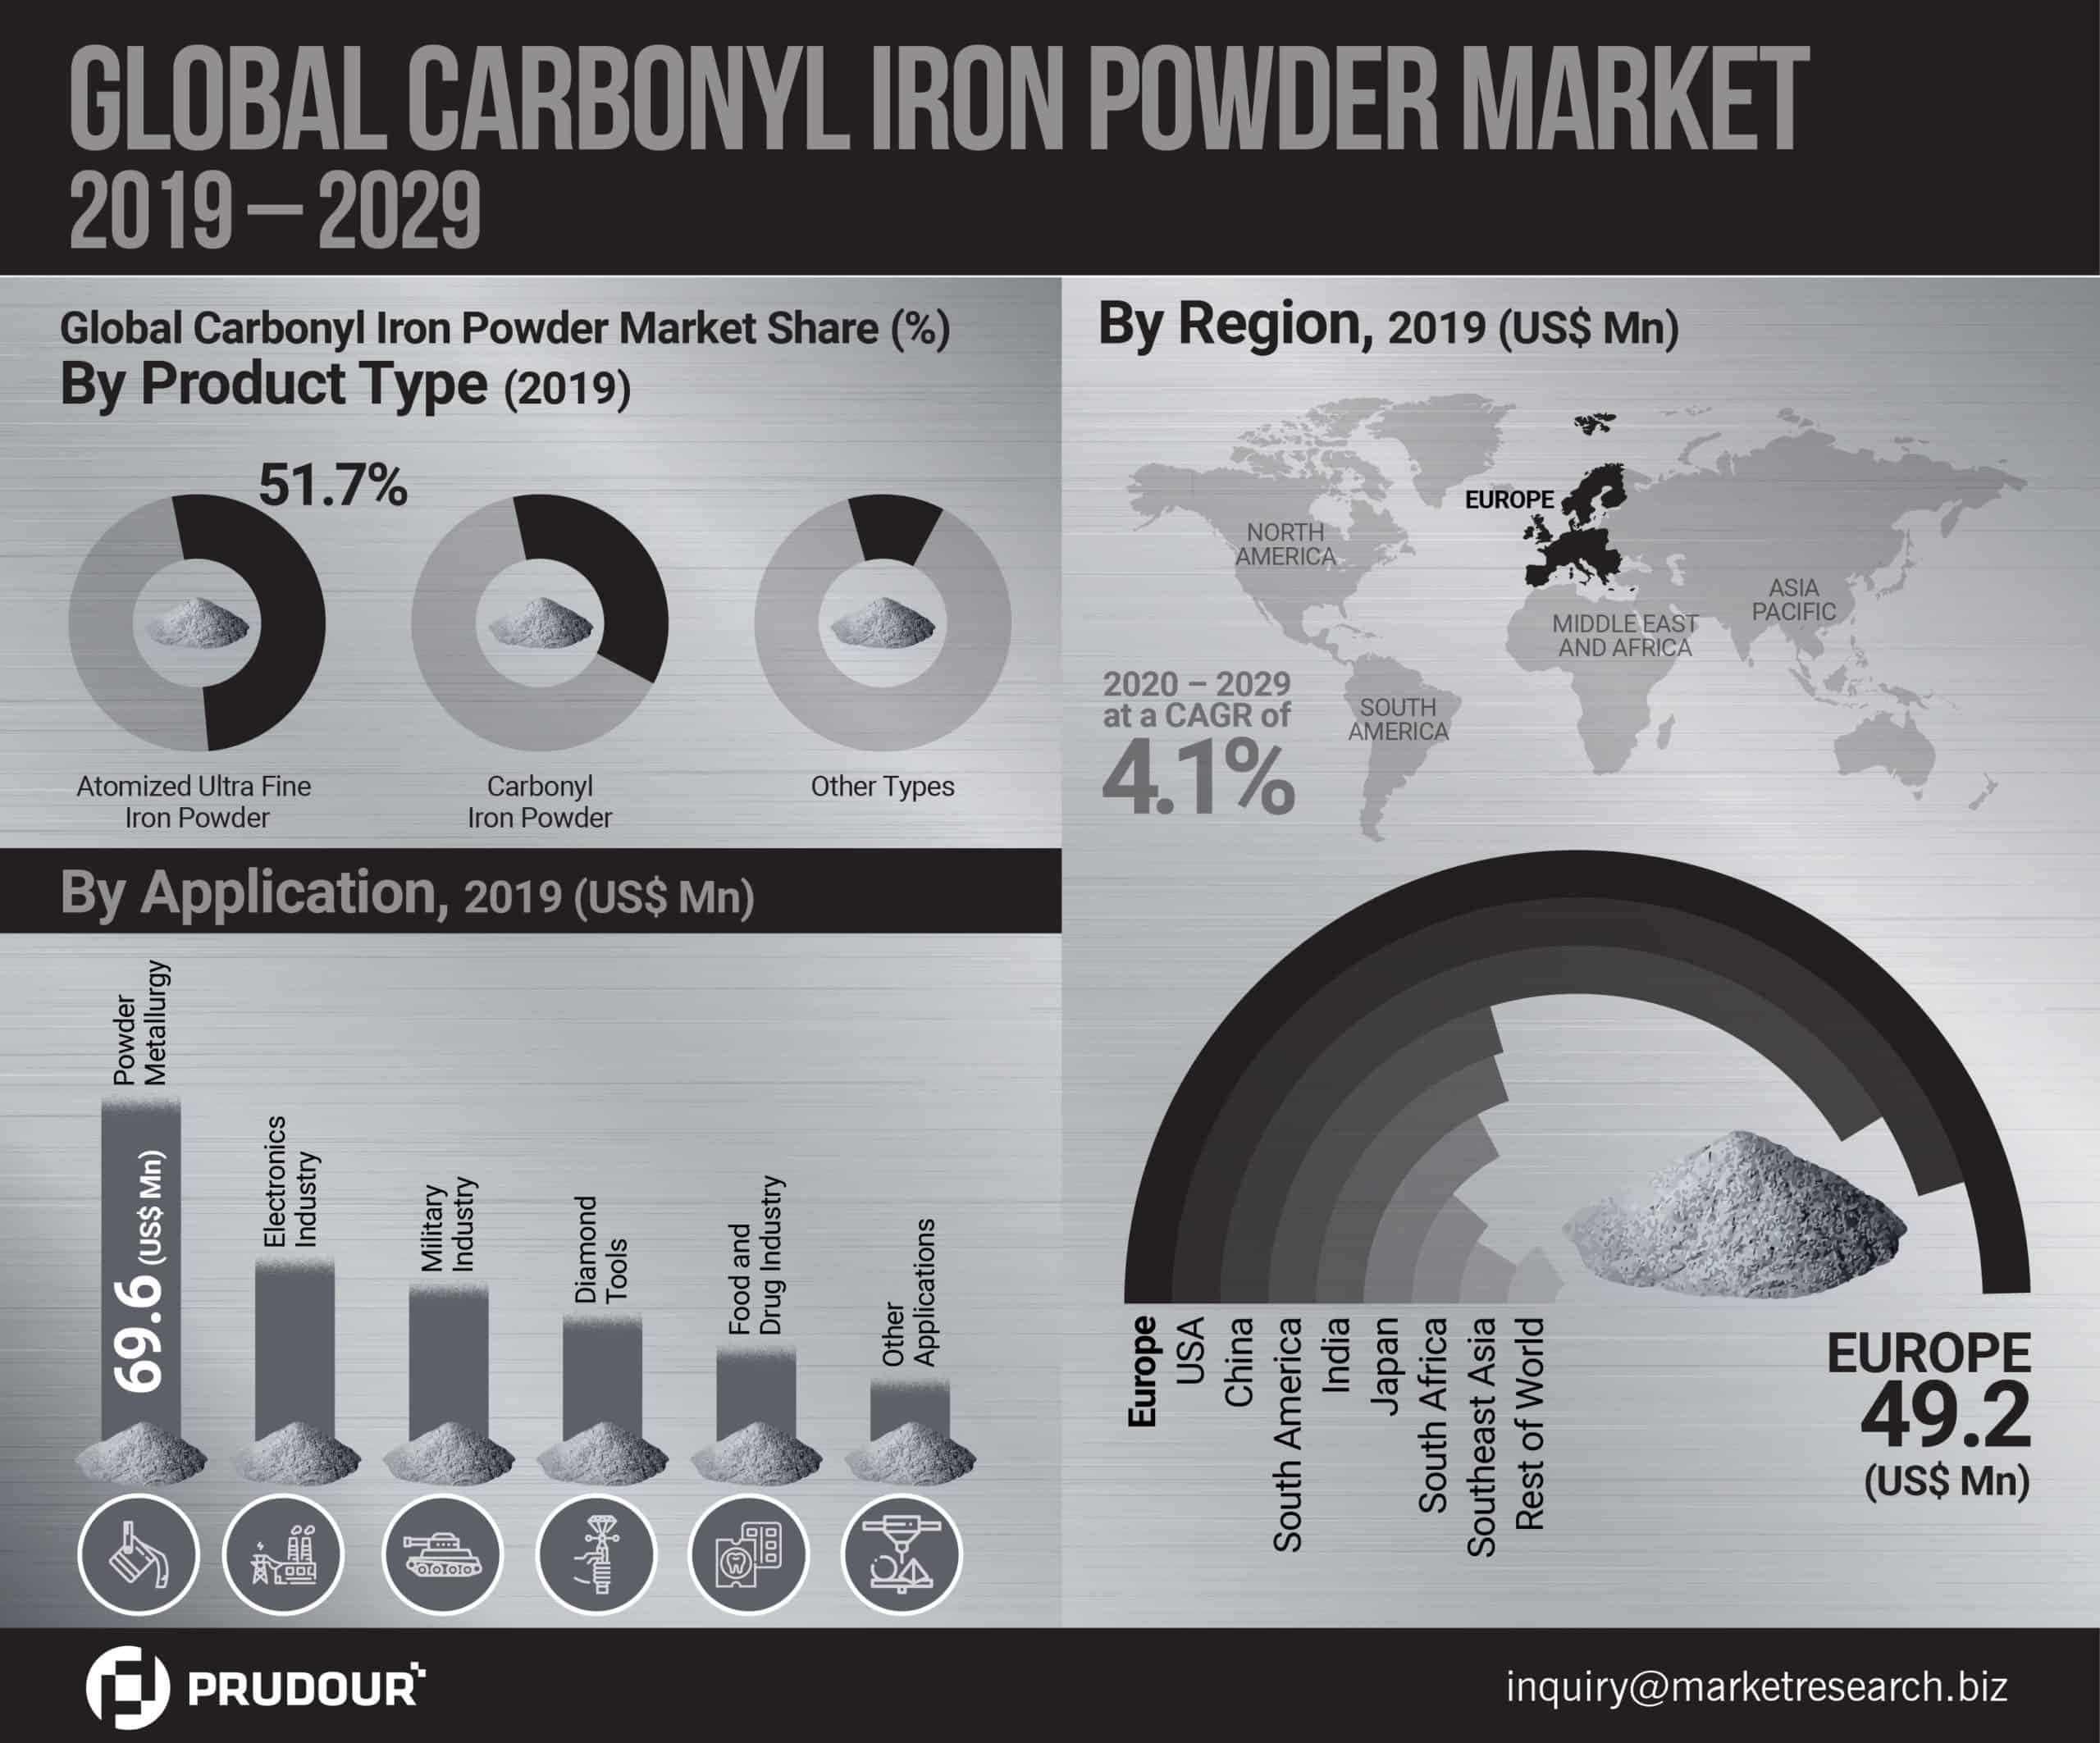 Carbonyl Iron Powder Market